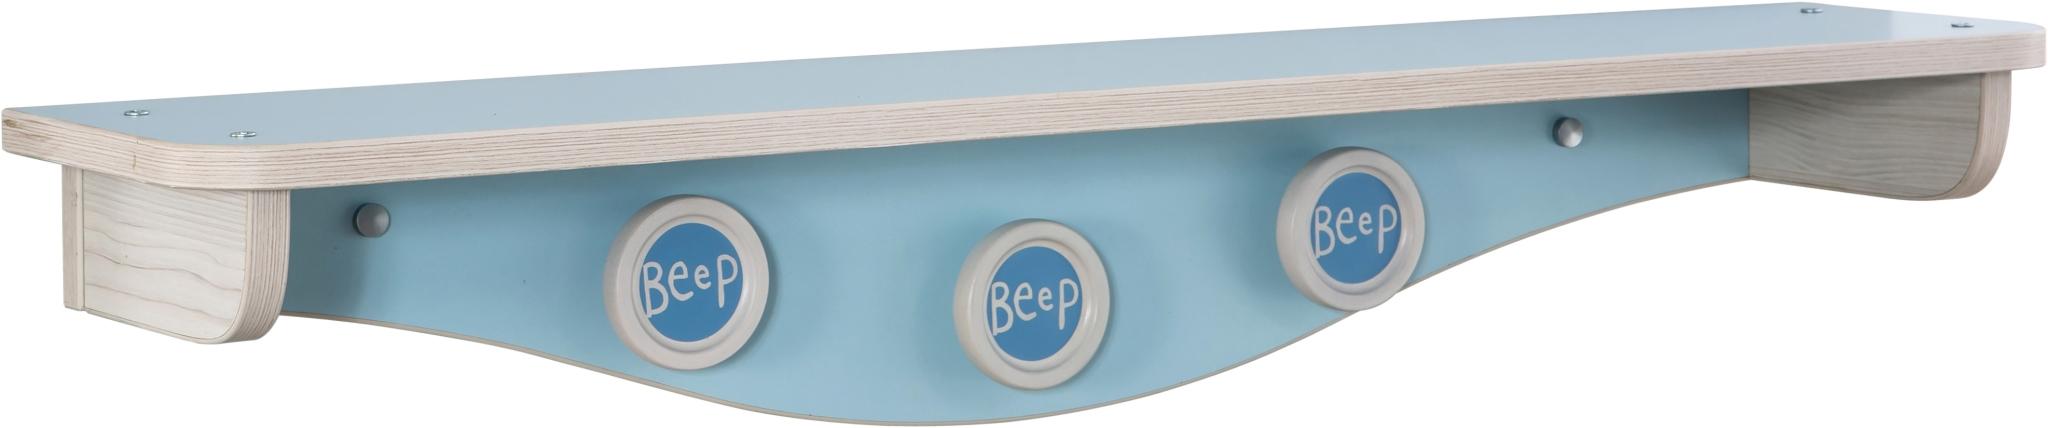 Etajera din pal pentru bebe Baby Boy Light Blue / Nature l86xA18xH15 cm